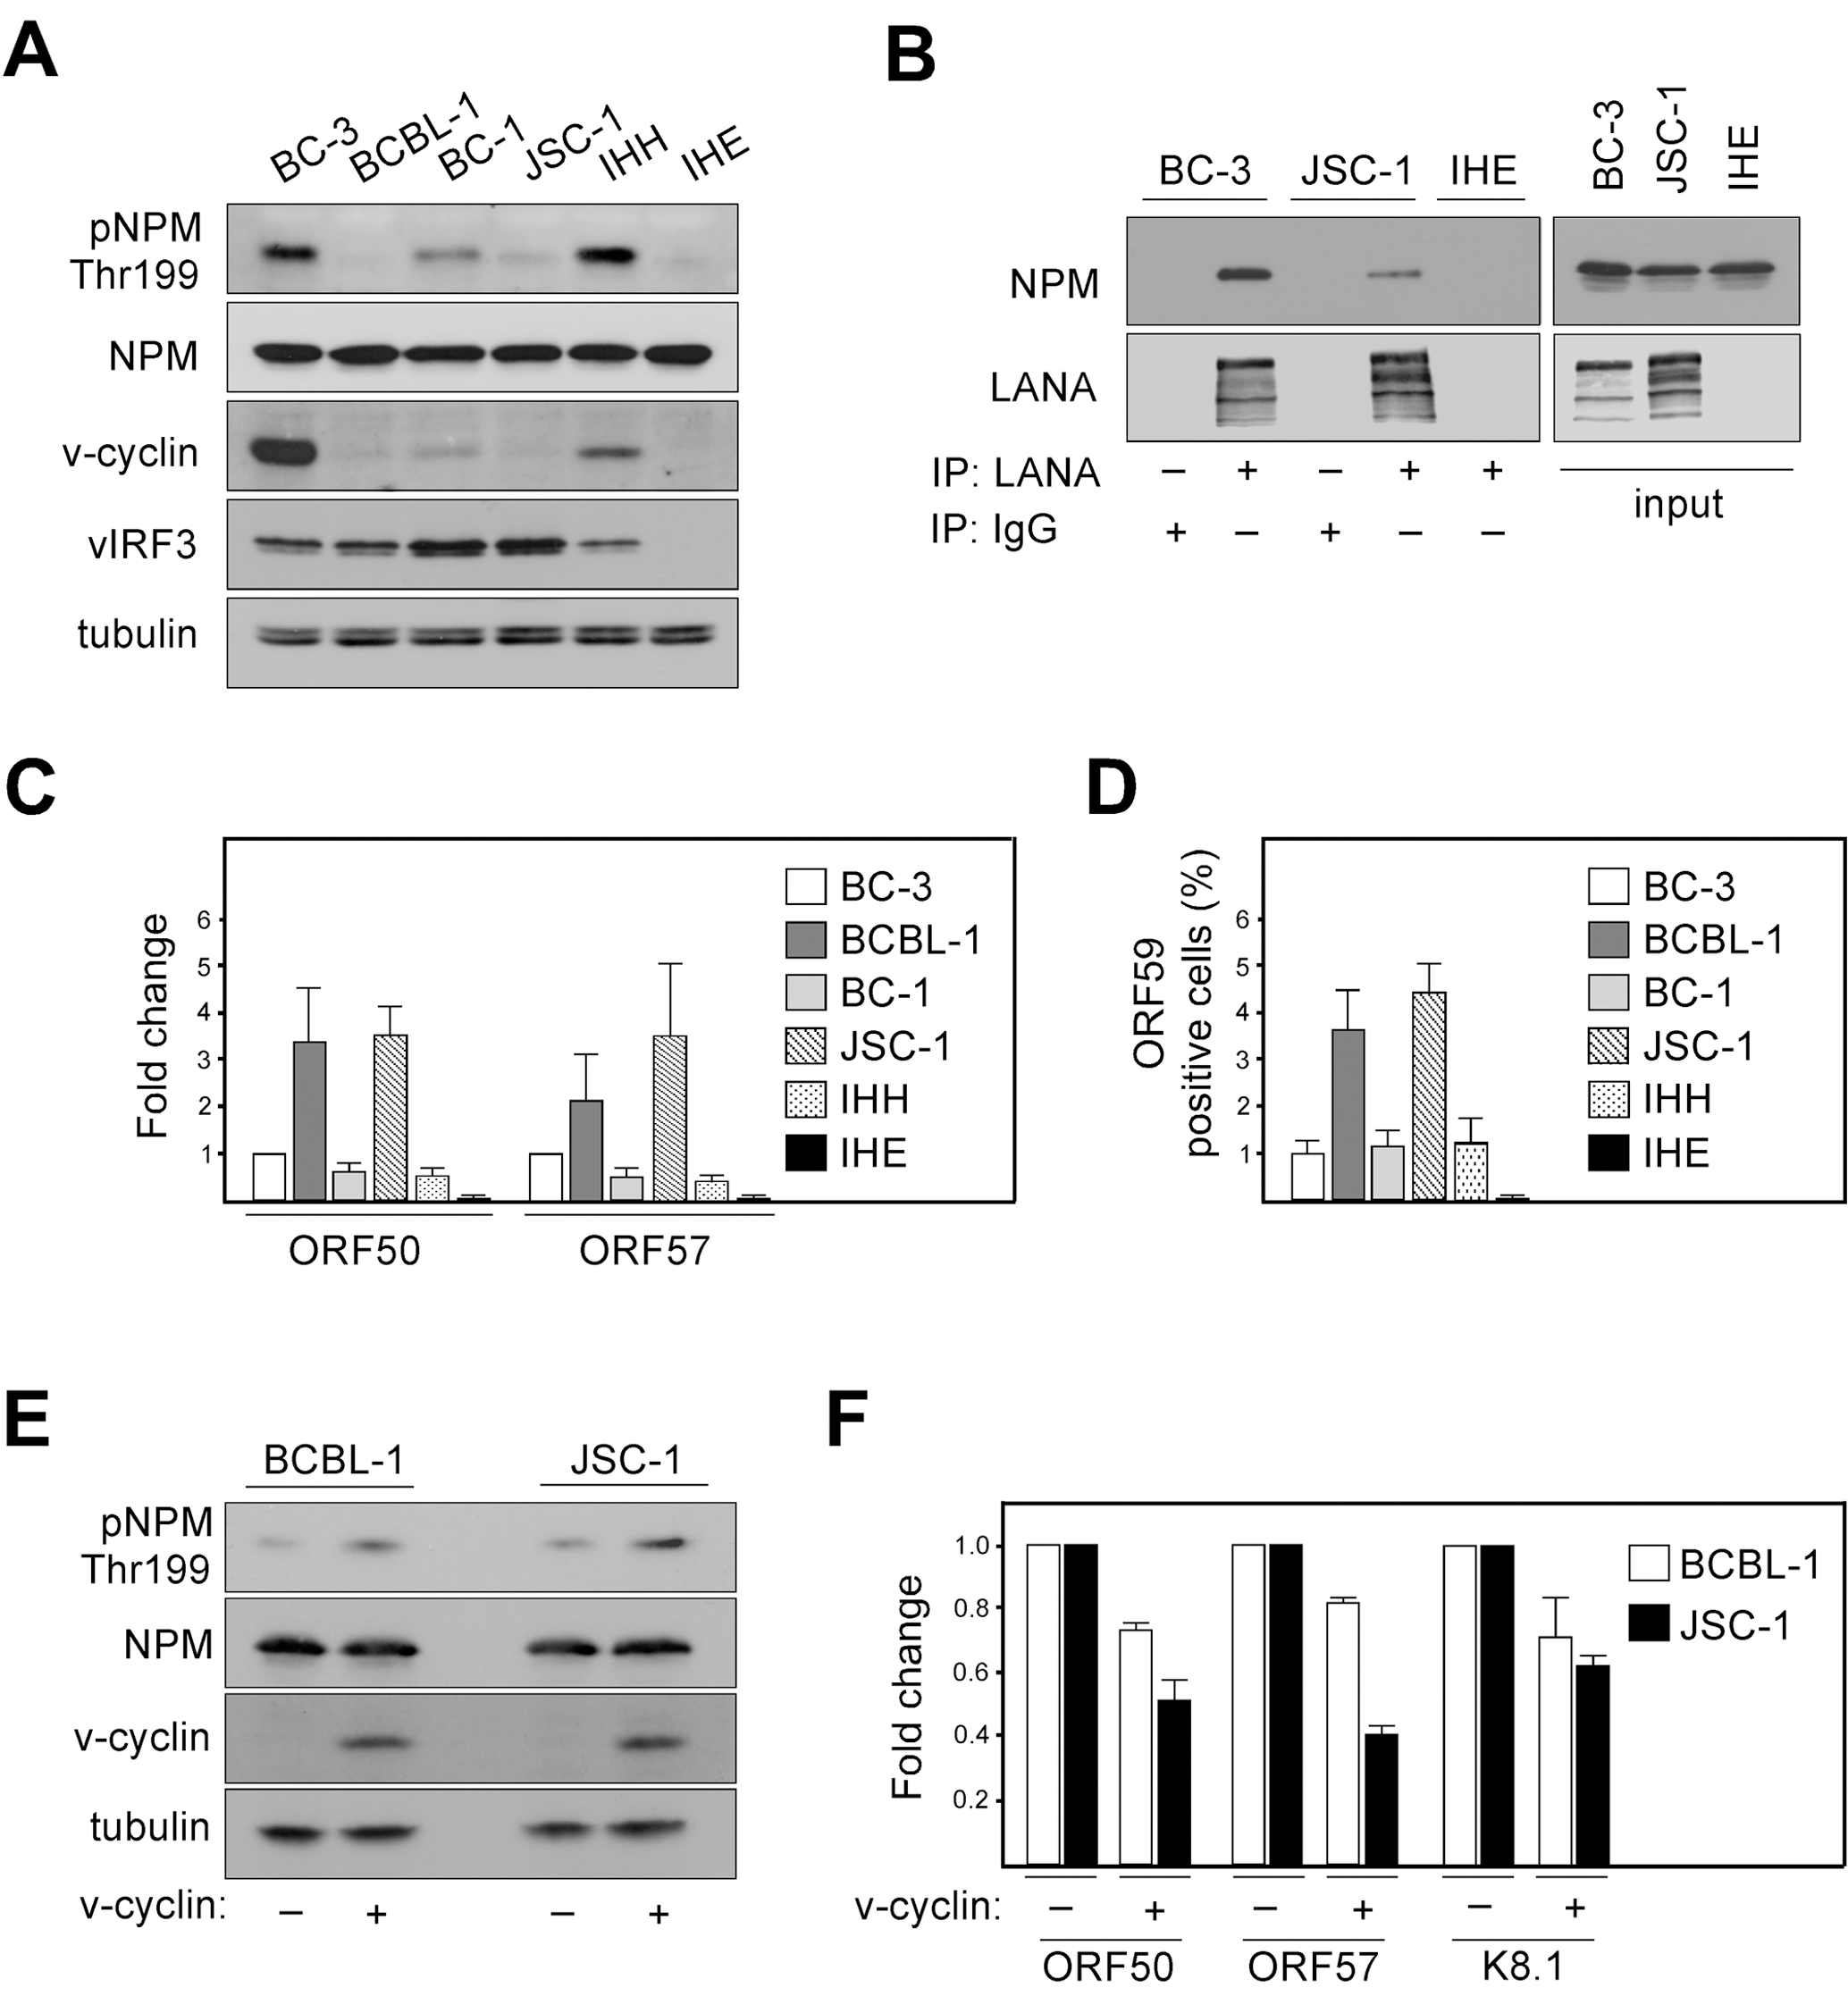 Phosphorylation of NPM correlates with KSHV latency.